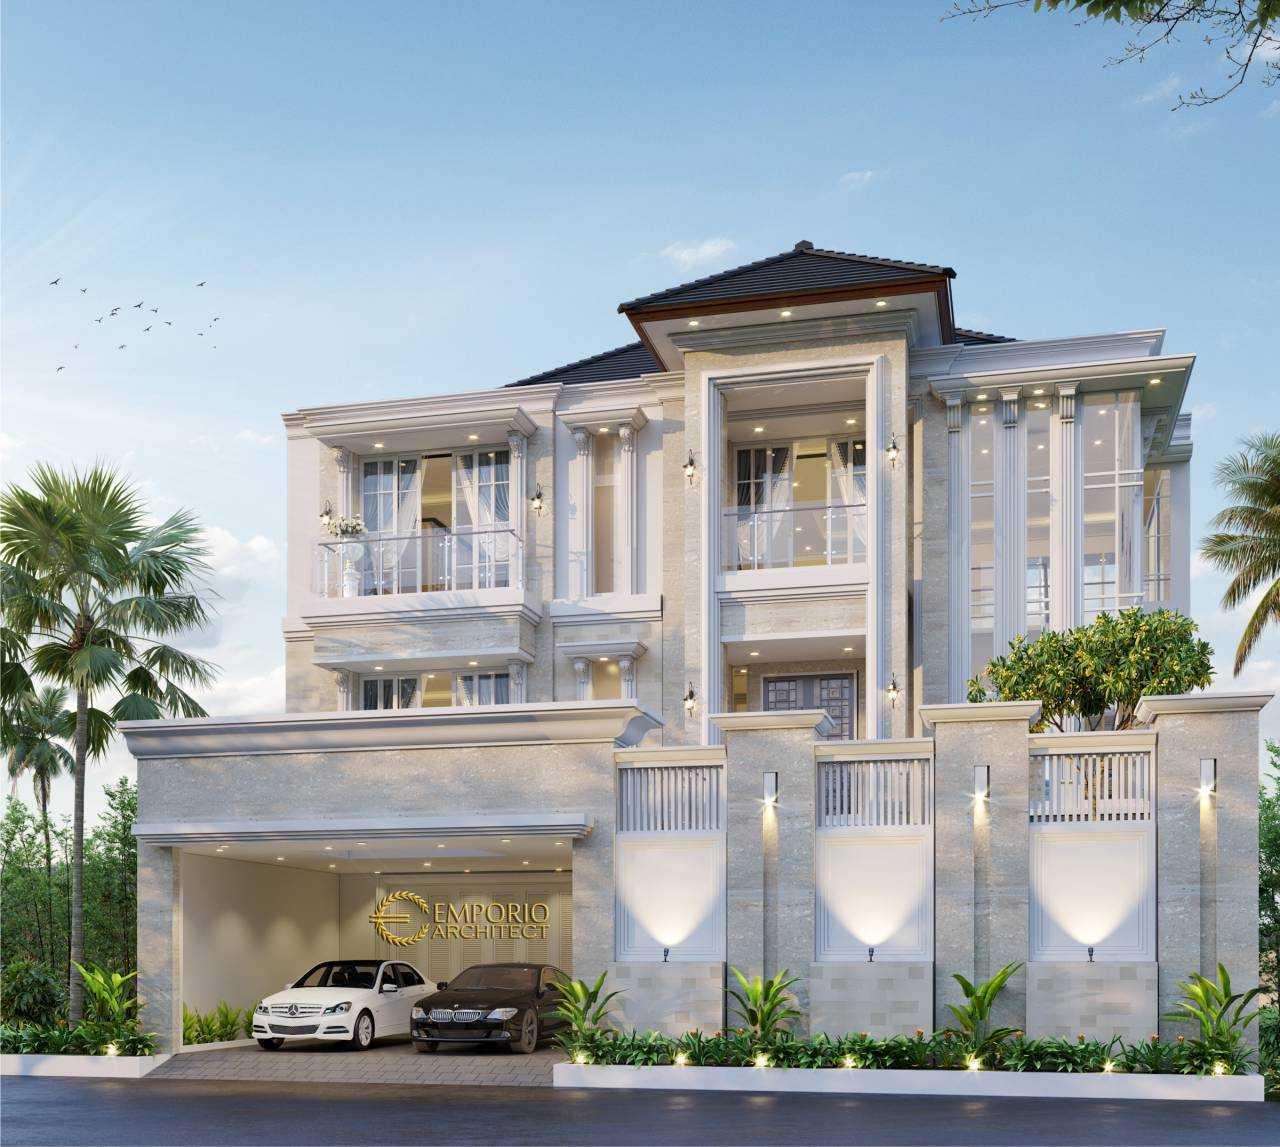 Emporio Architect Jasa Arsitek Tangerang Desain Rumah Classic 2 Lantai 797 @ Tangerang Tangerang, Kota Tangerang, Banten, Indonesia Tangerang, Kota Tangerang, Banten, Indonesia Emporio-Architect-Jasa-Arsitek-Tangerang-Desain-Rumah-Classic-2-Lantai-797-Tangerang  90646